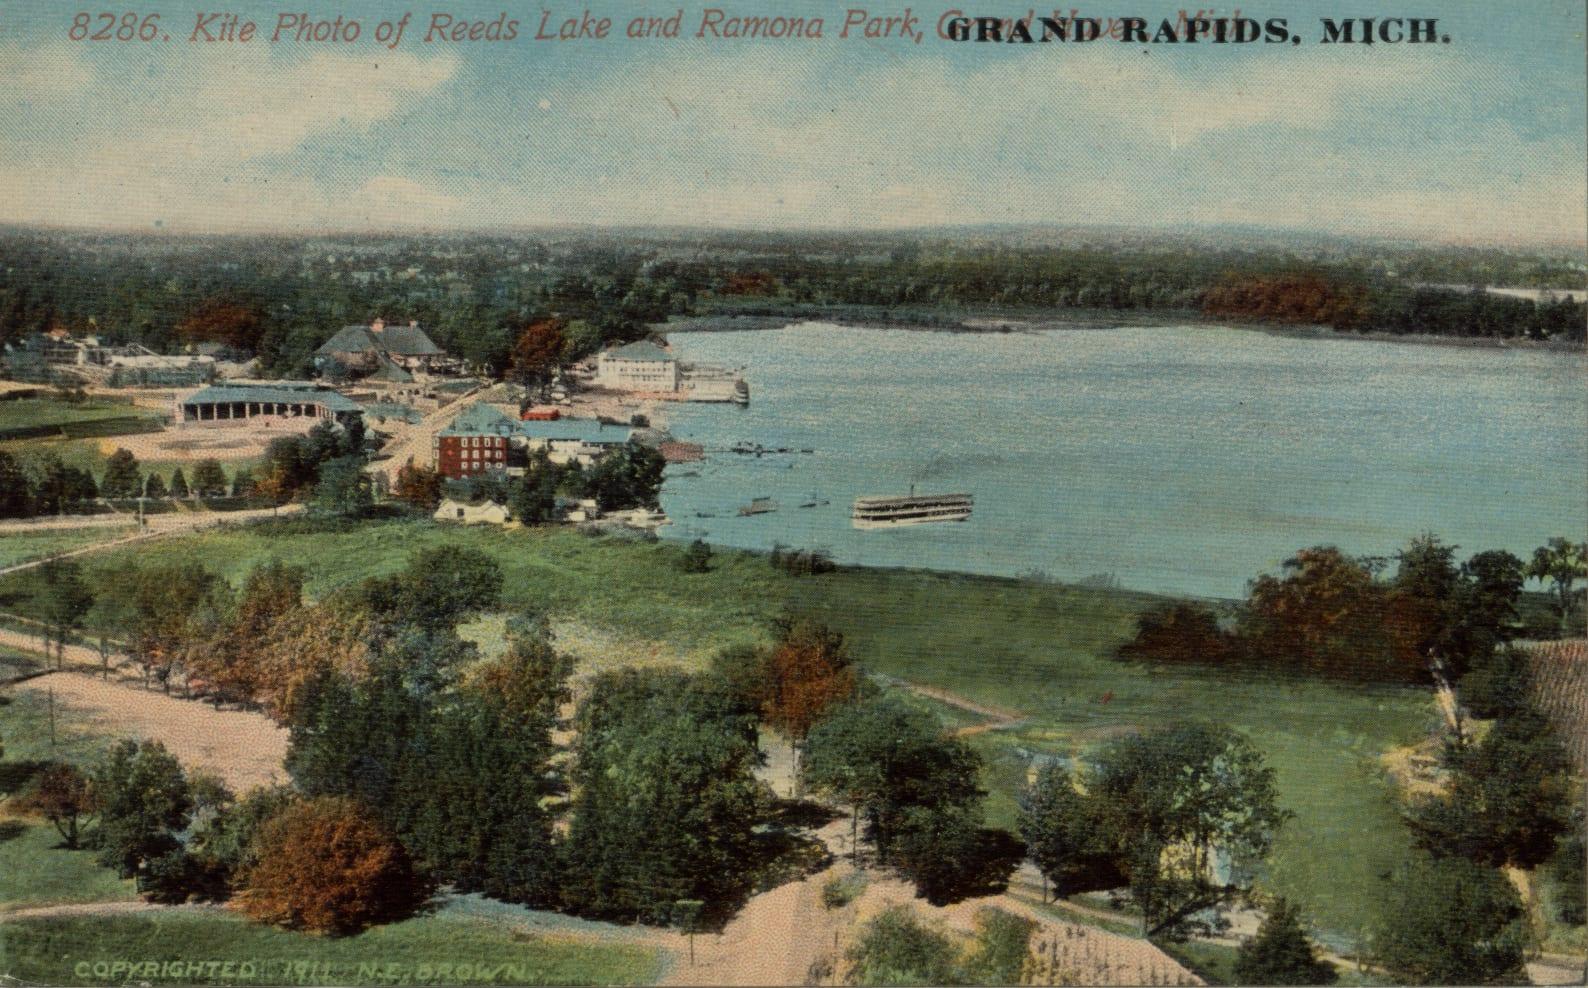 Kite_Photo_of_Reeds_Lake_and_Ramona_Park,_Grand_Rapids_MI._Postcard_-_001